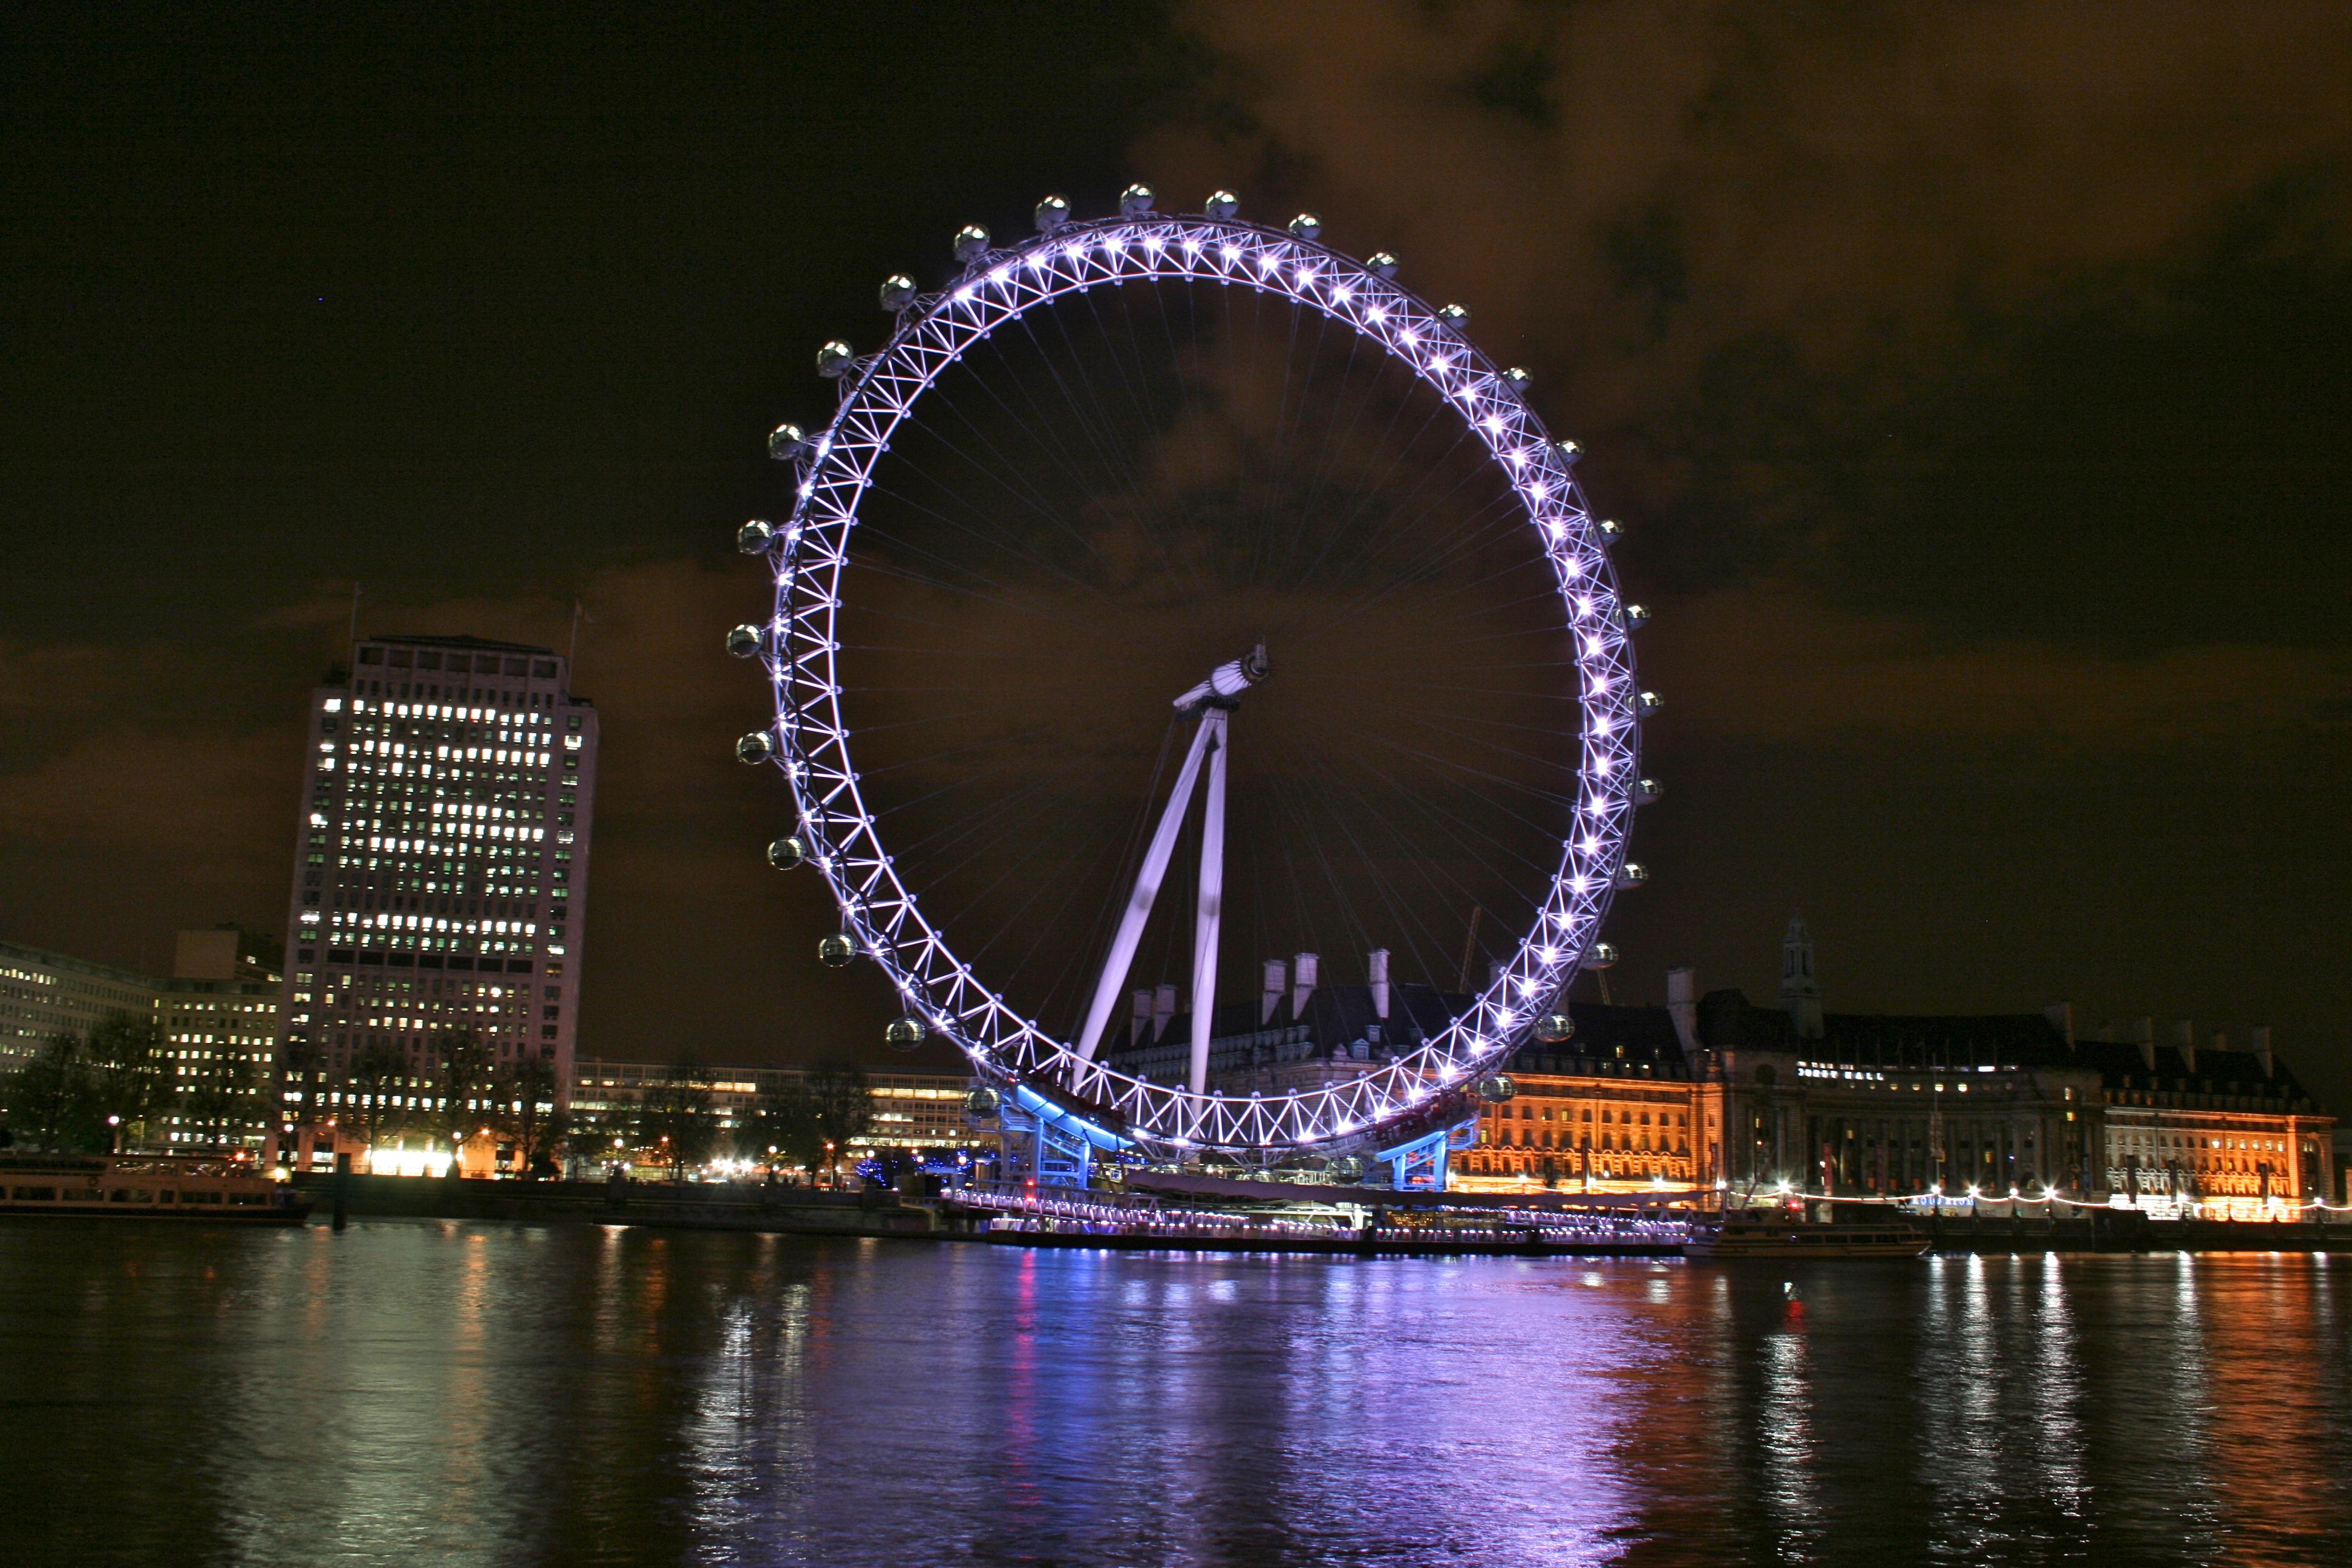 Tits on london eye